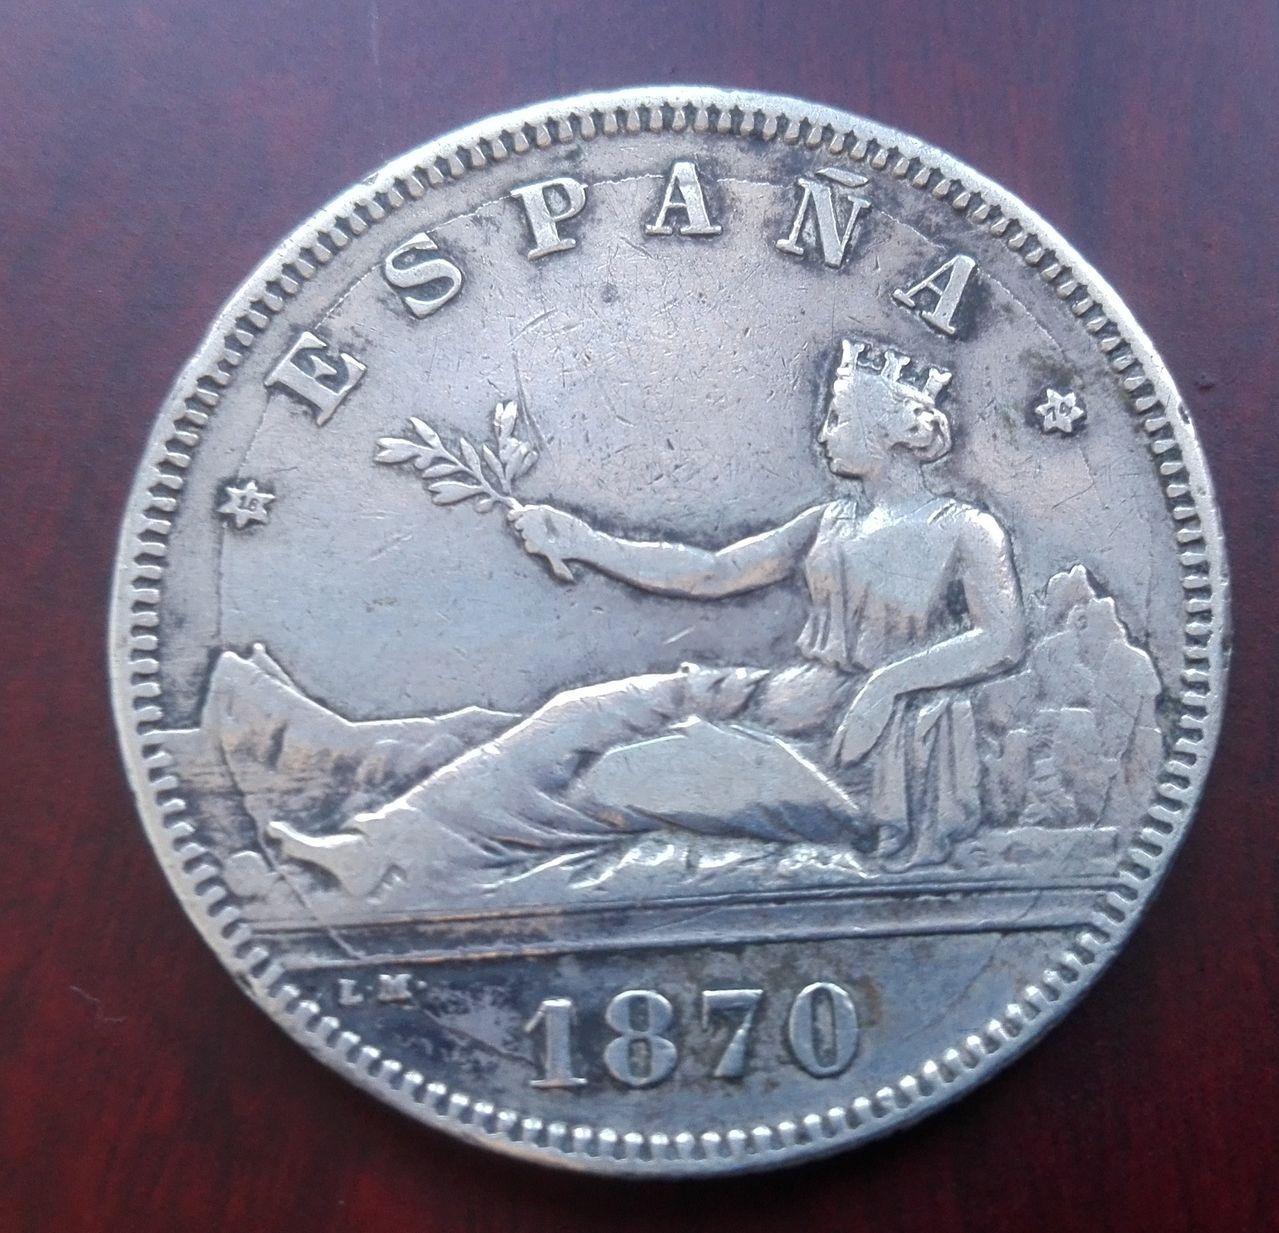 2 pesetas 1870 *74 2_pesetas_1870_74_a